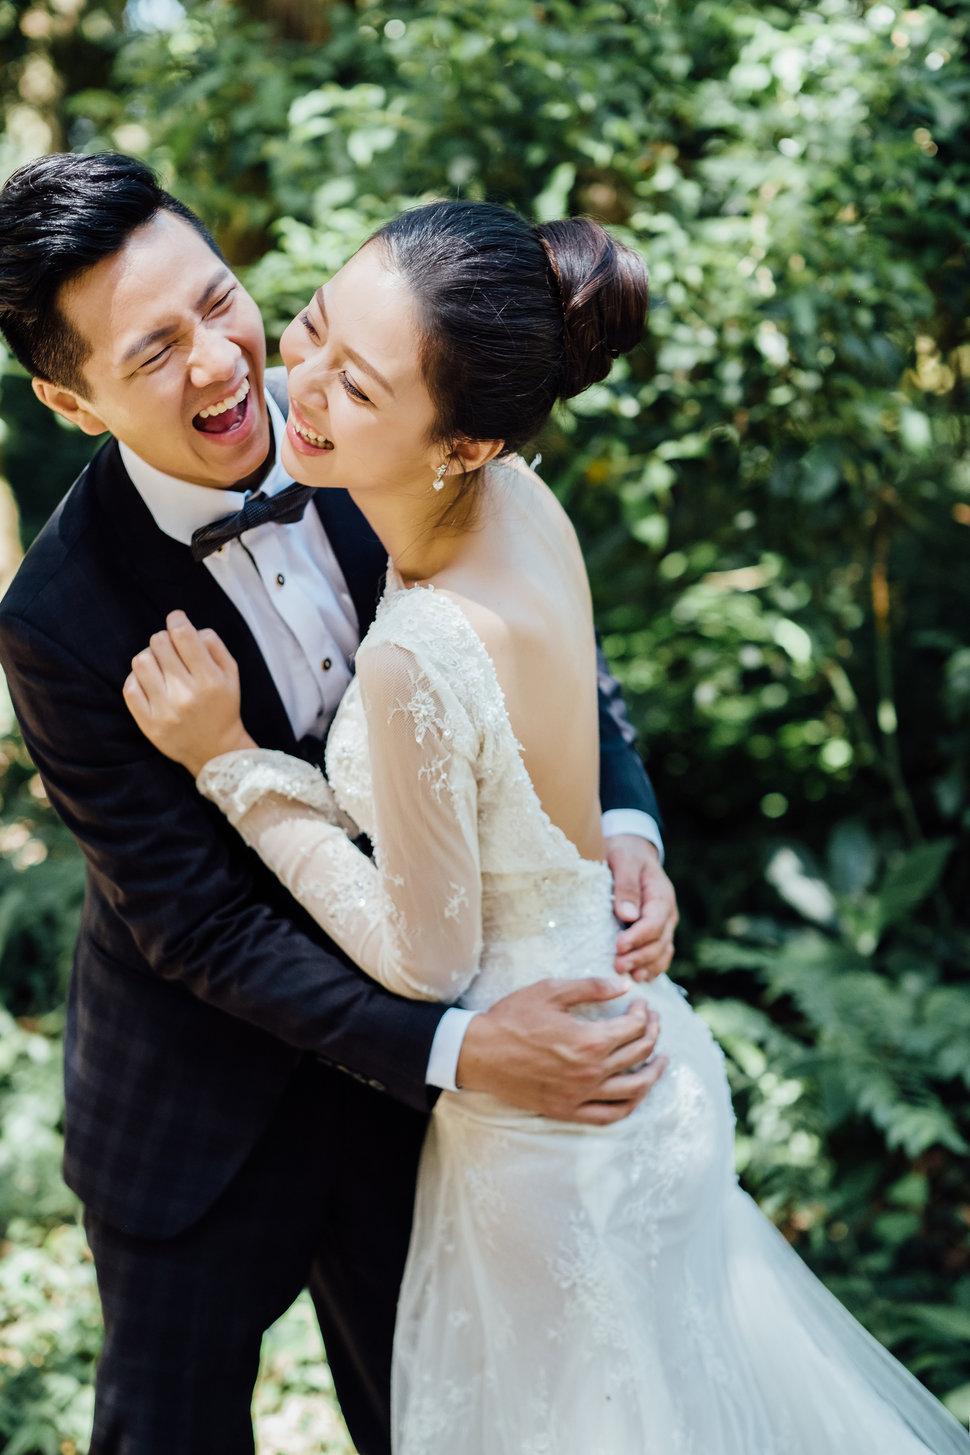 2017-07-22-09h56m43-DSCF4825 - Vicky Li 新娘秘書《結婚吧》